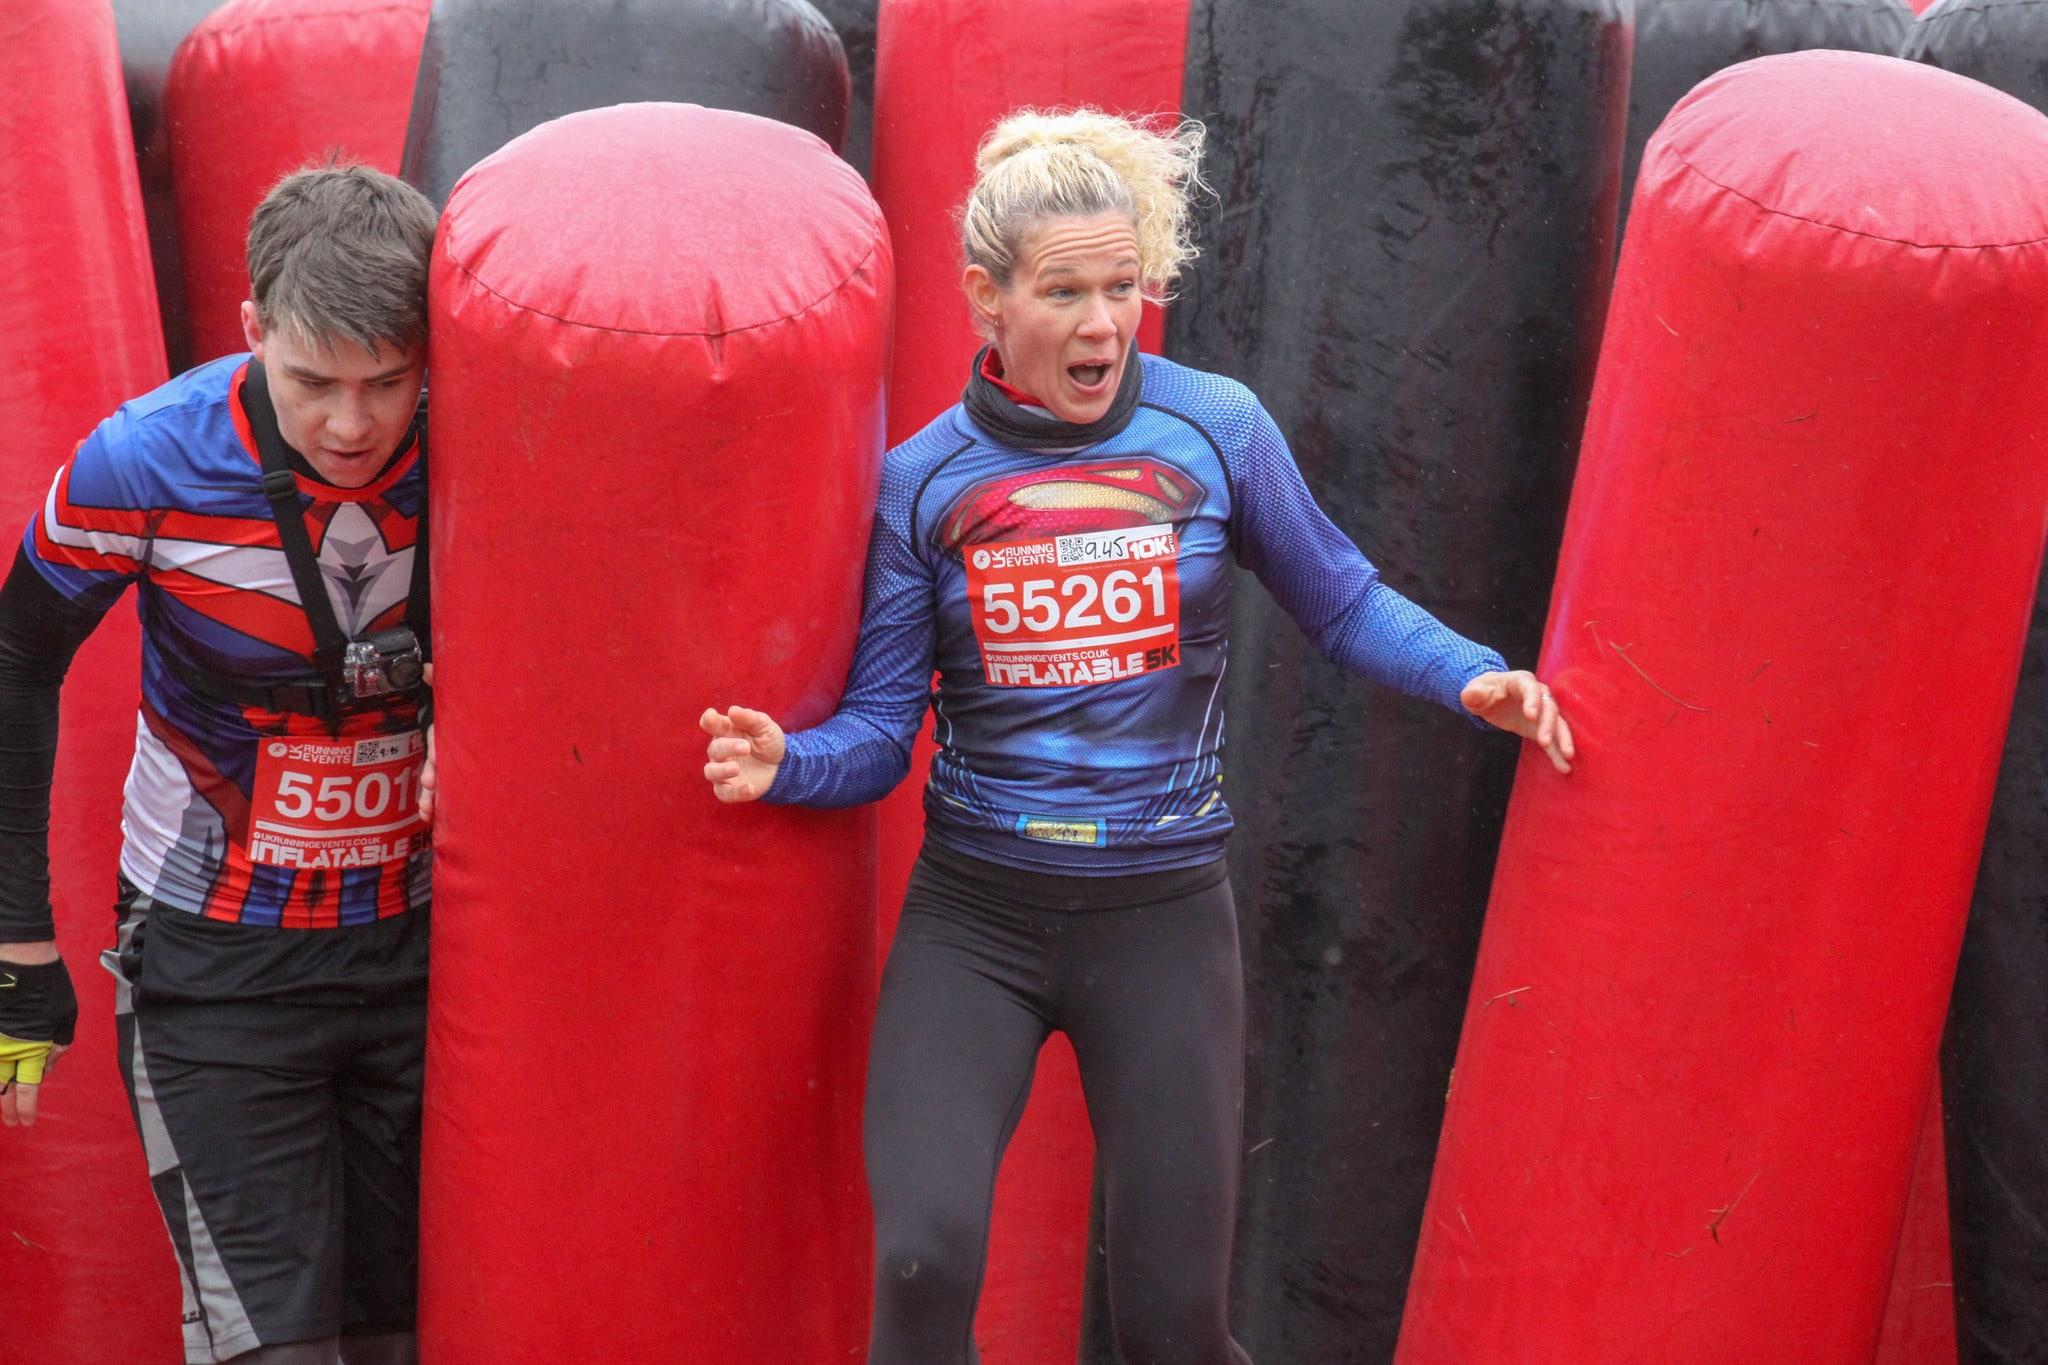 Inflatable Runs - St. Albans